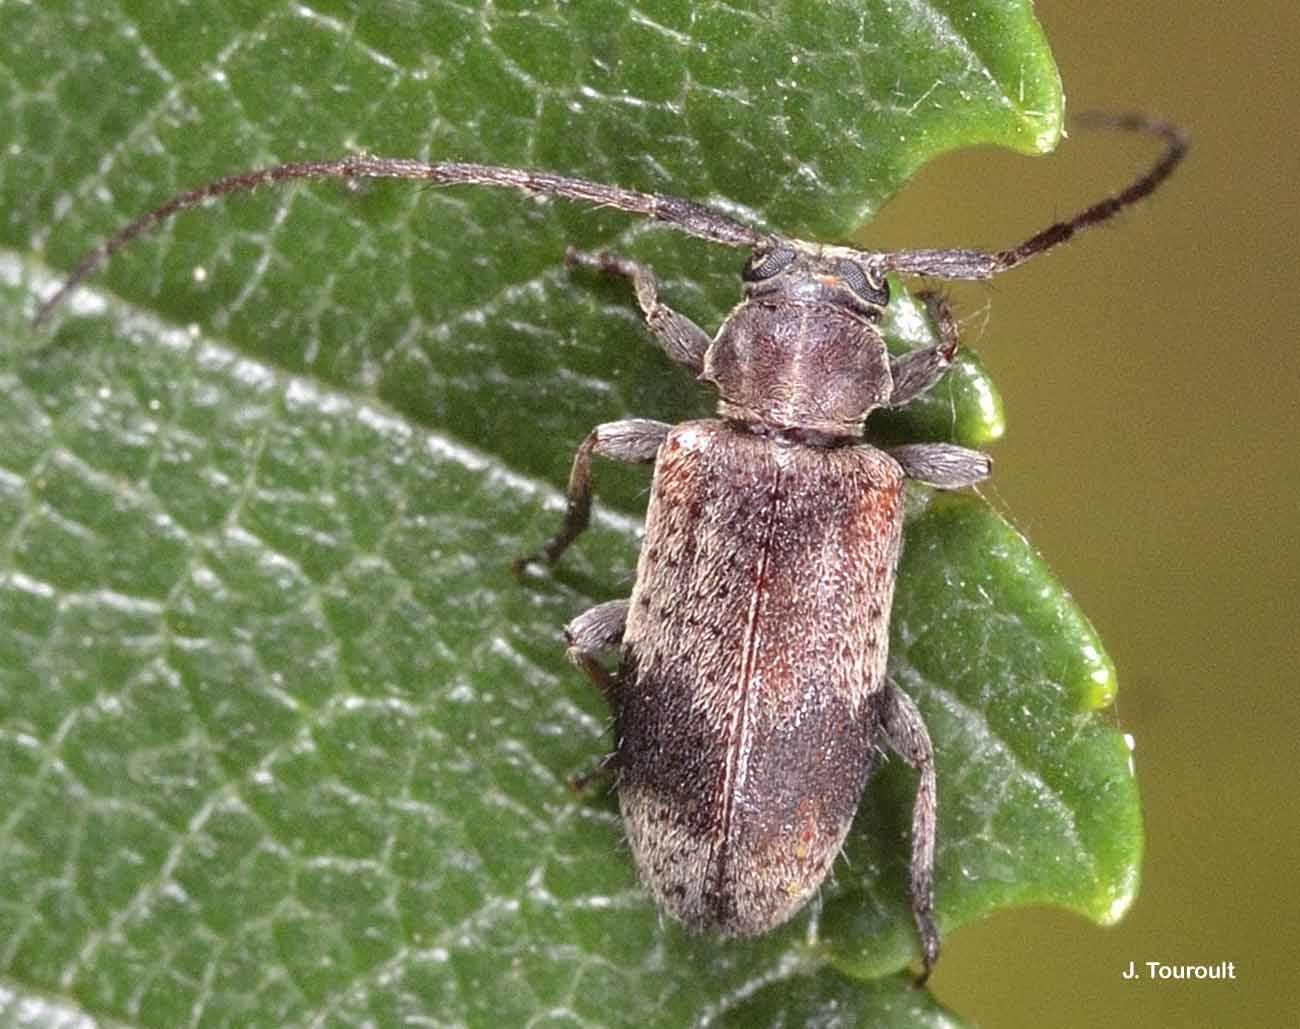 Exocentrus punctipennis